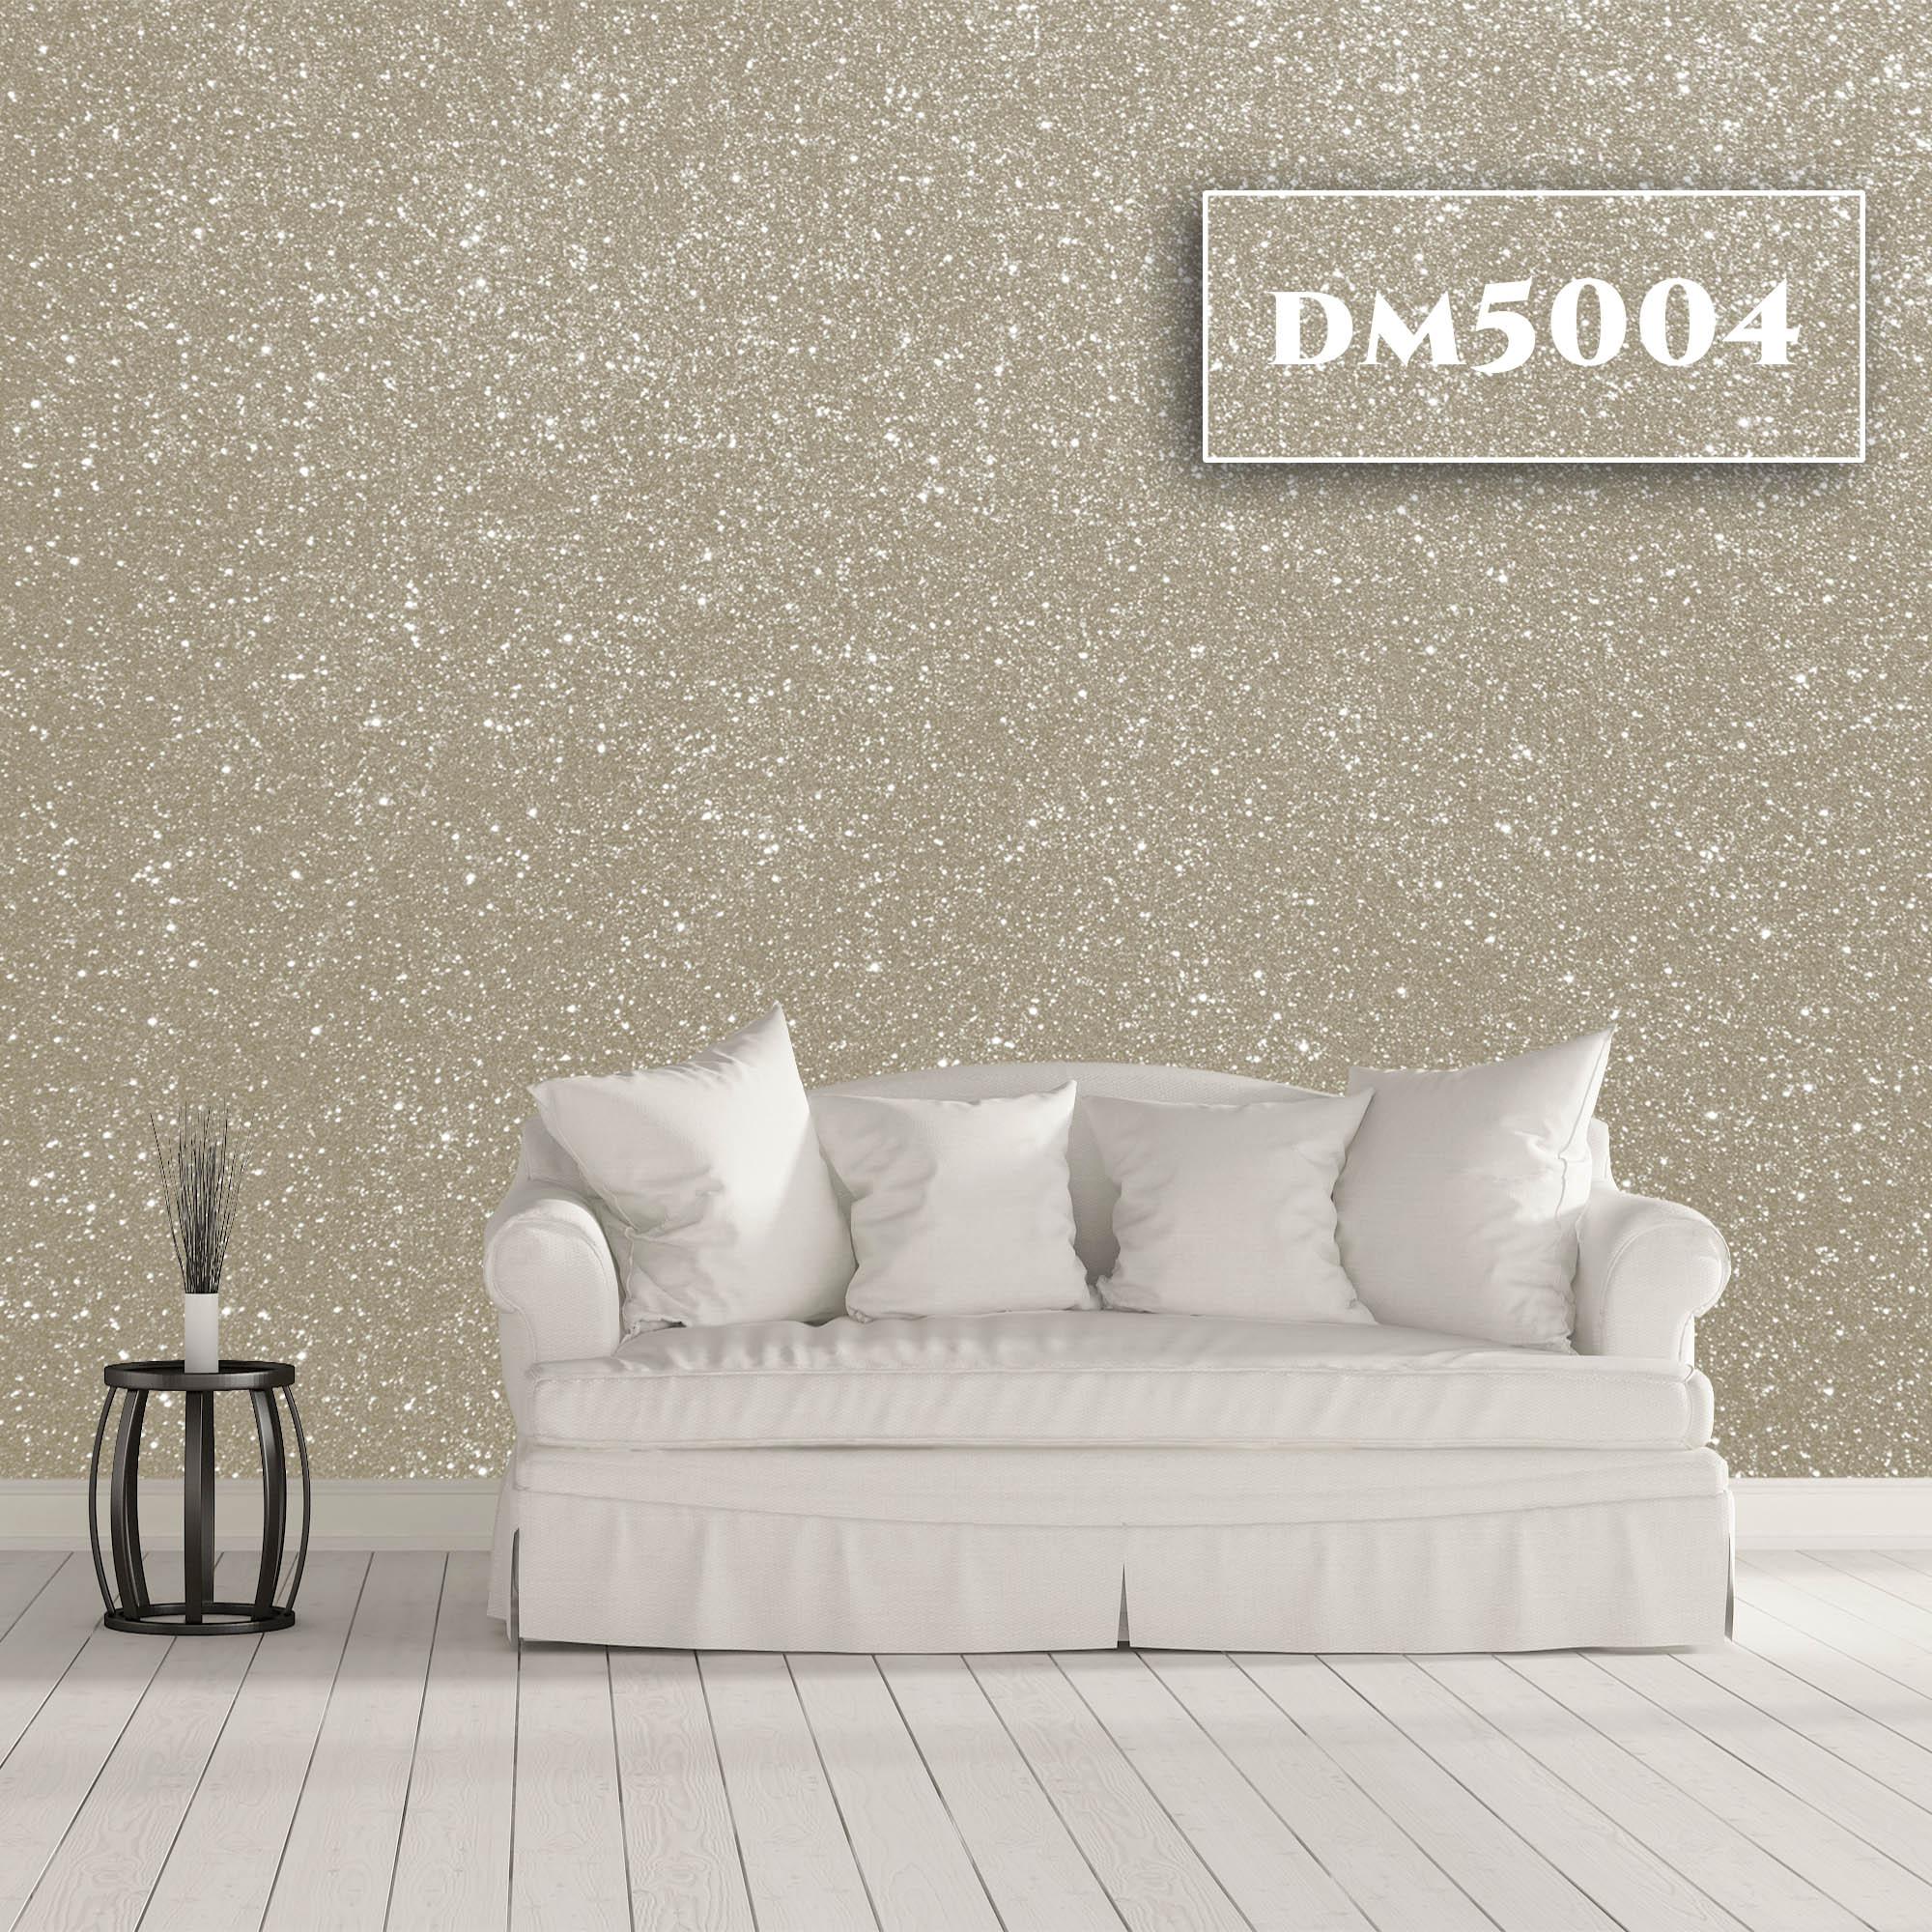 DM5004